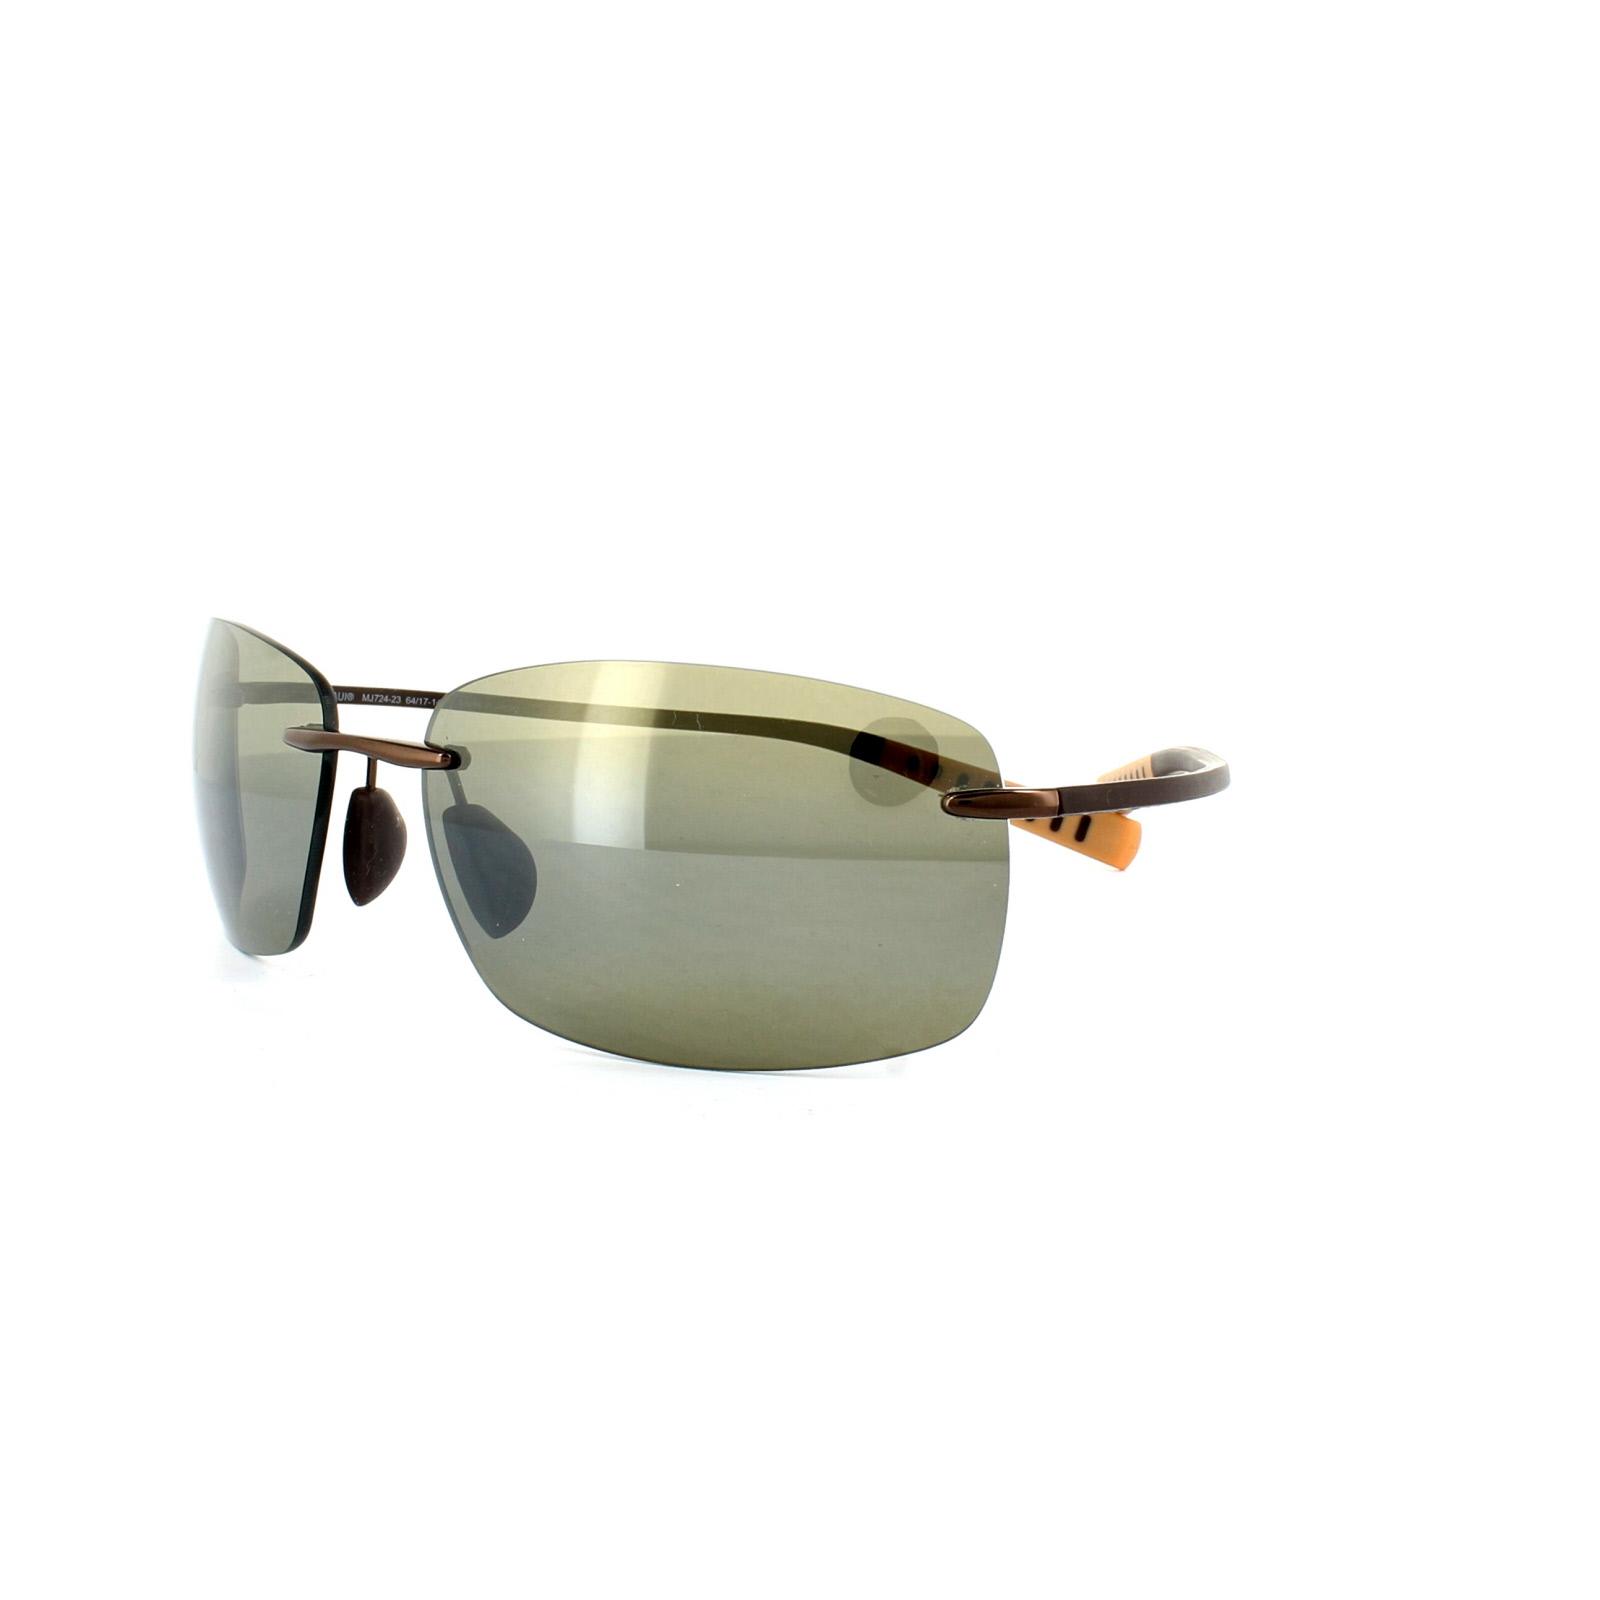 9416be7679 Maui Jim Sunglasses Ebay Uk